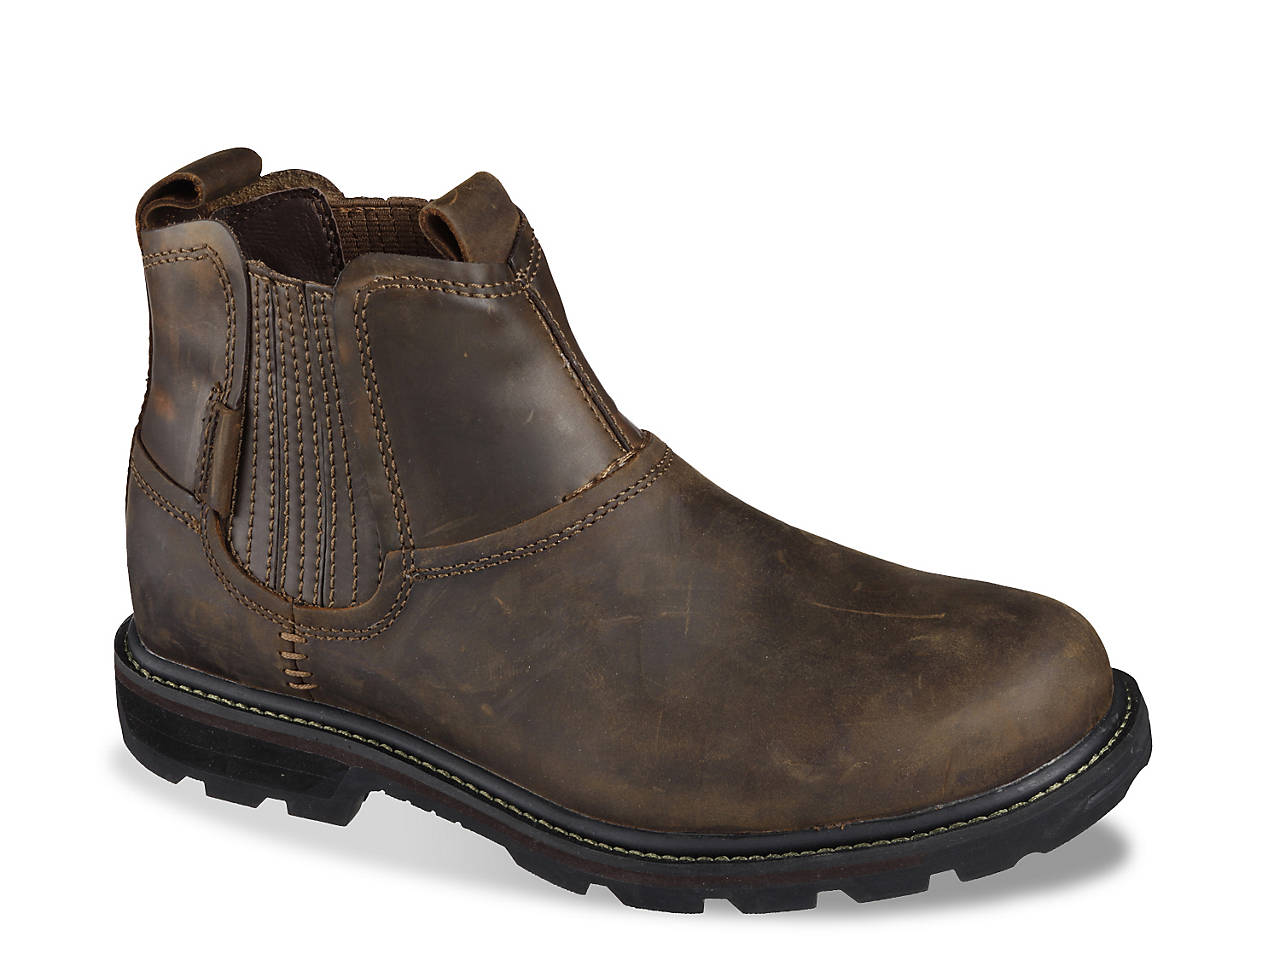 skechers boots sold near me